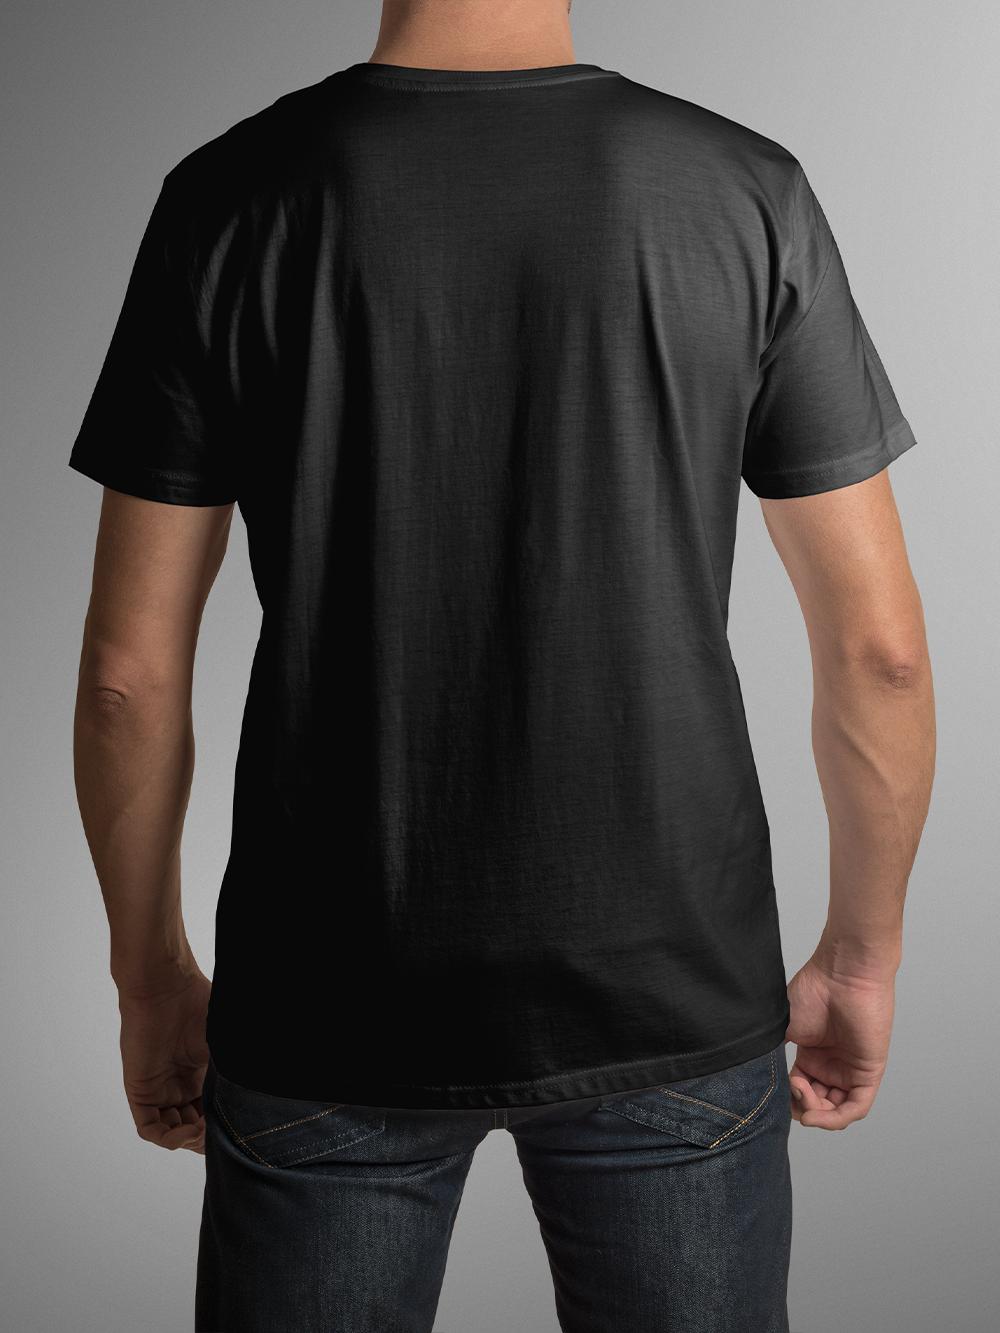 T-Shirt Gaming Marathon, Bumbac, Negru